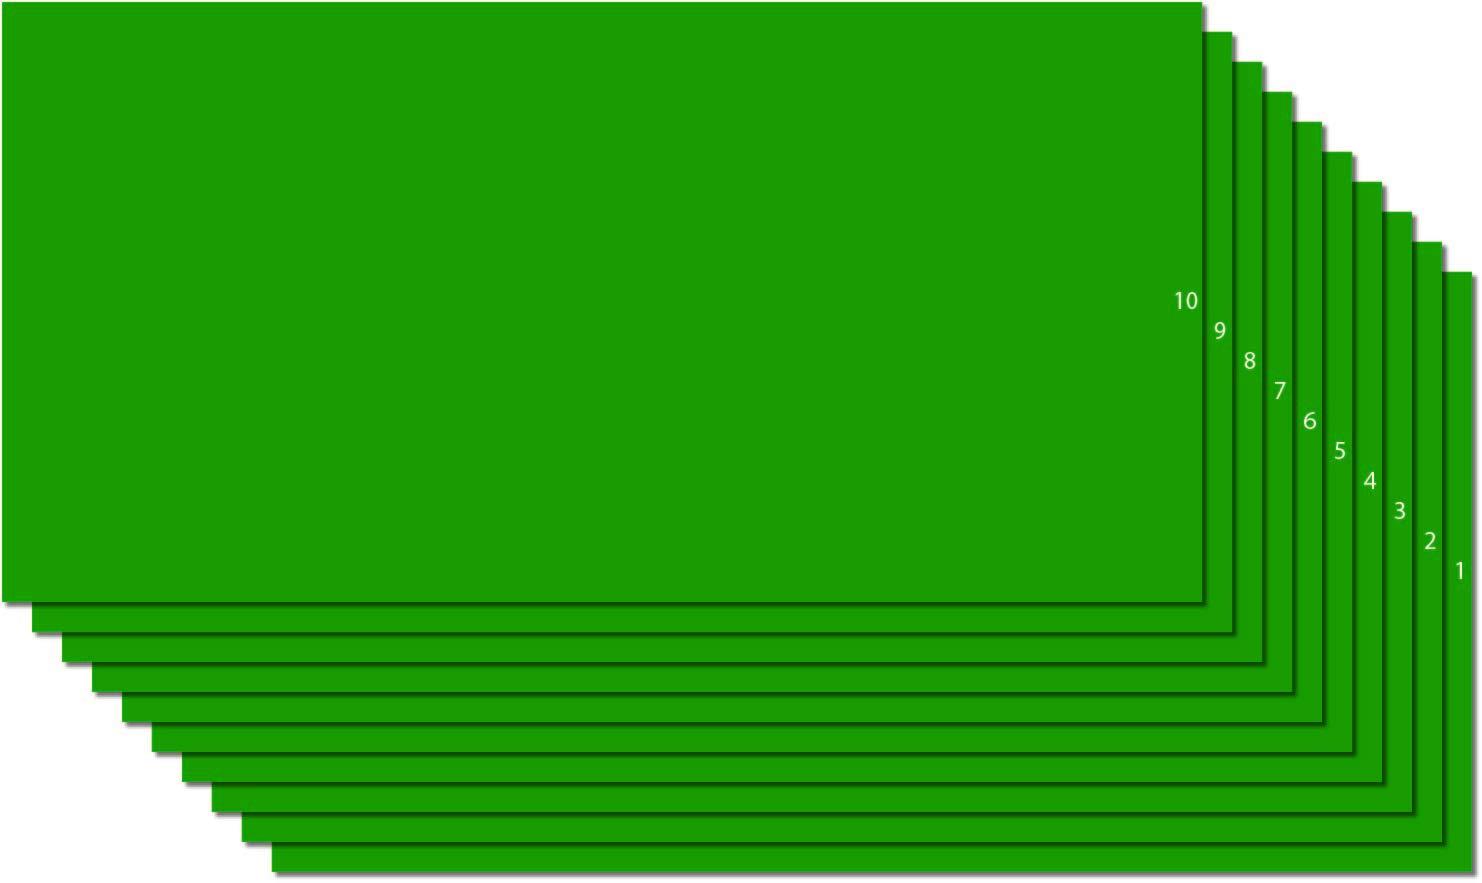 Green Intermediate Cal Vinyl Made in USA, Assembled by DevonPro 12  x 24  10 Sheets (Metallic gold)